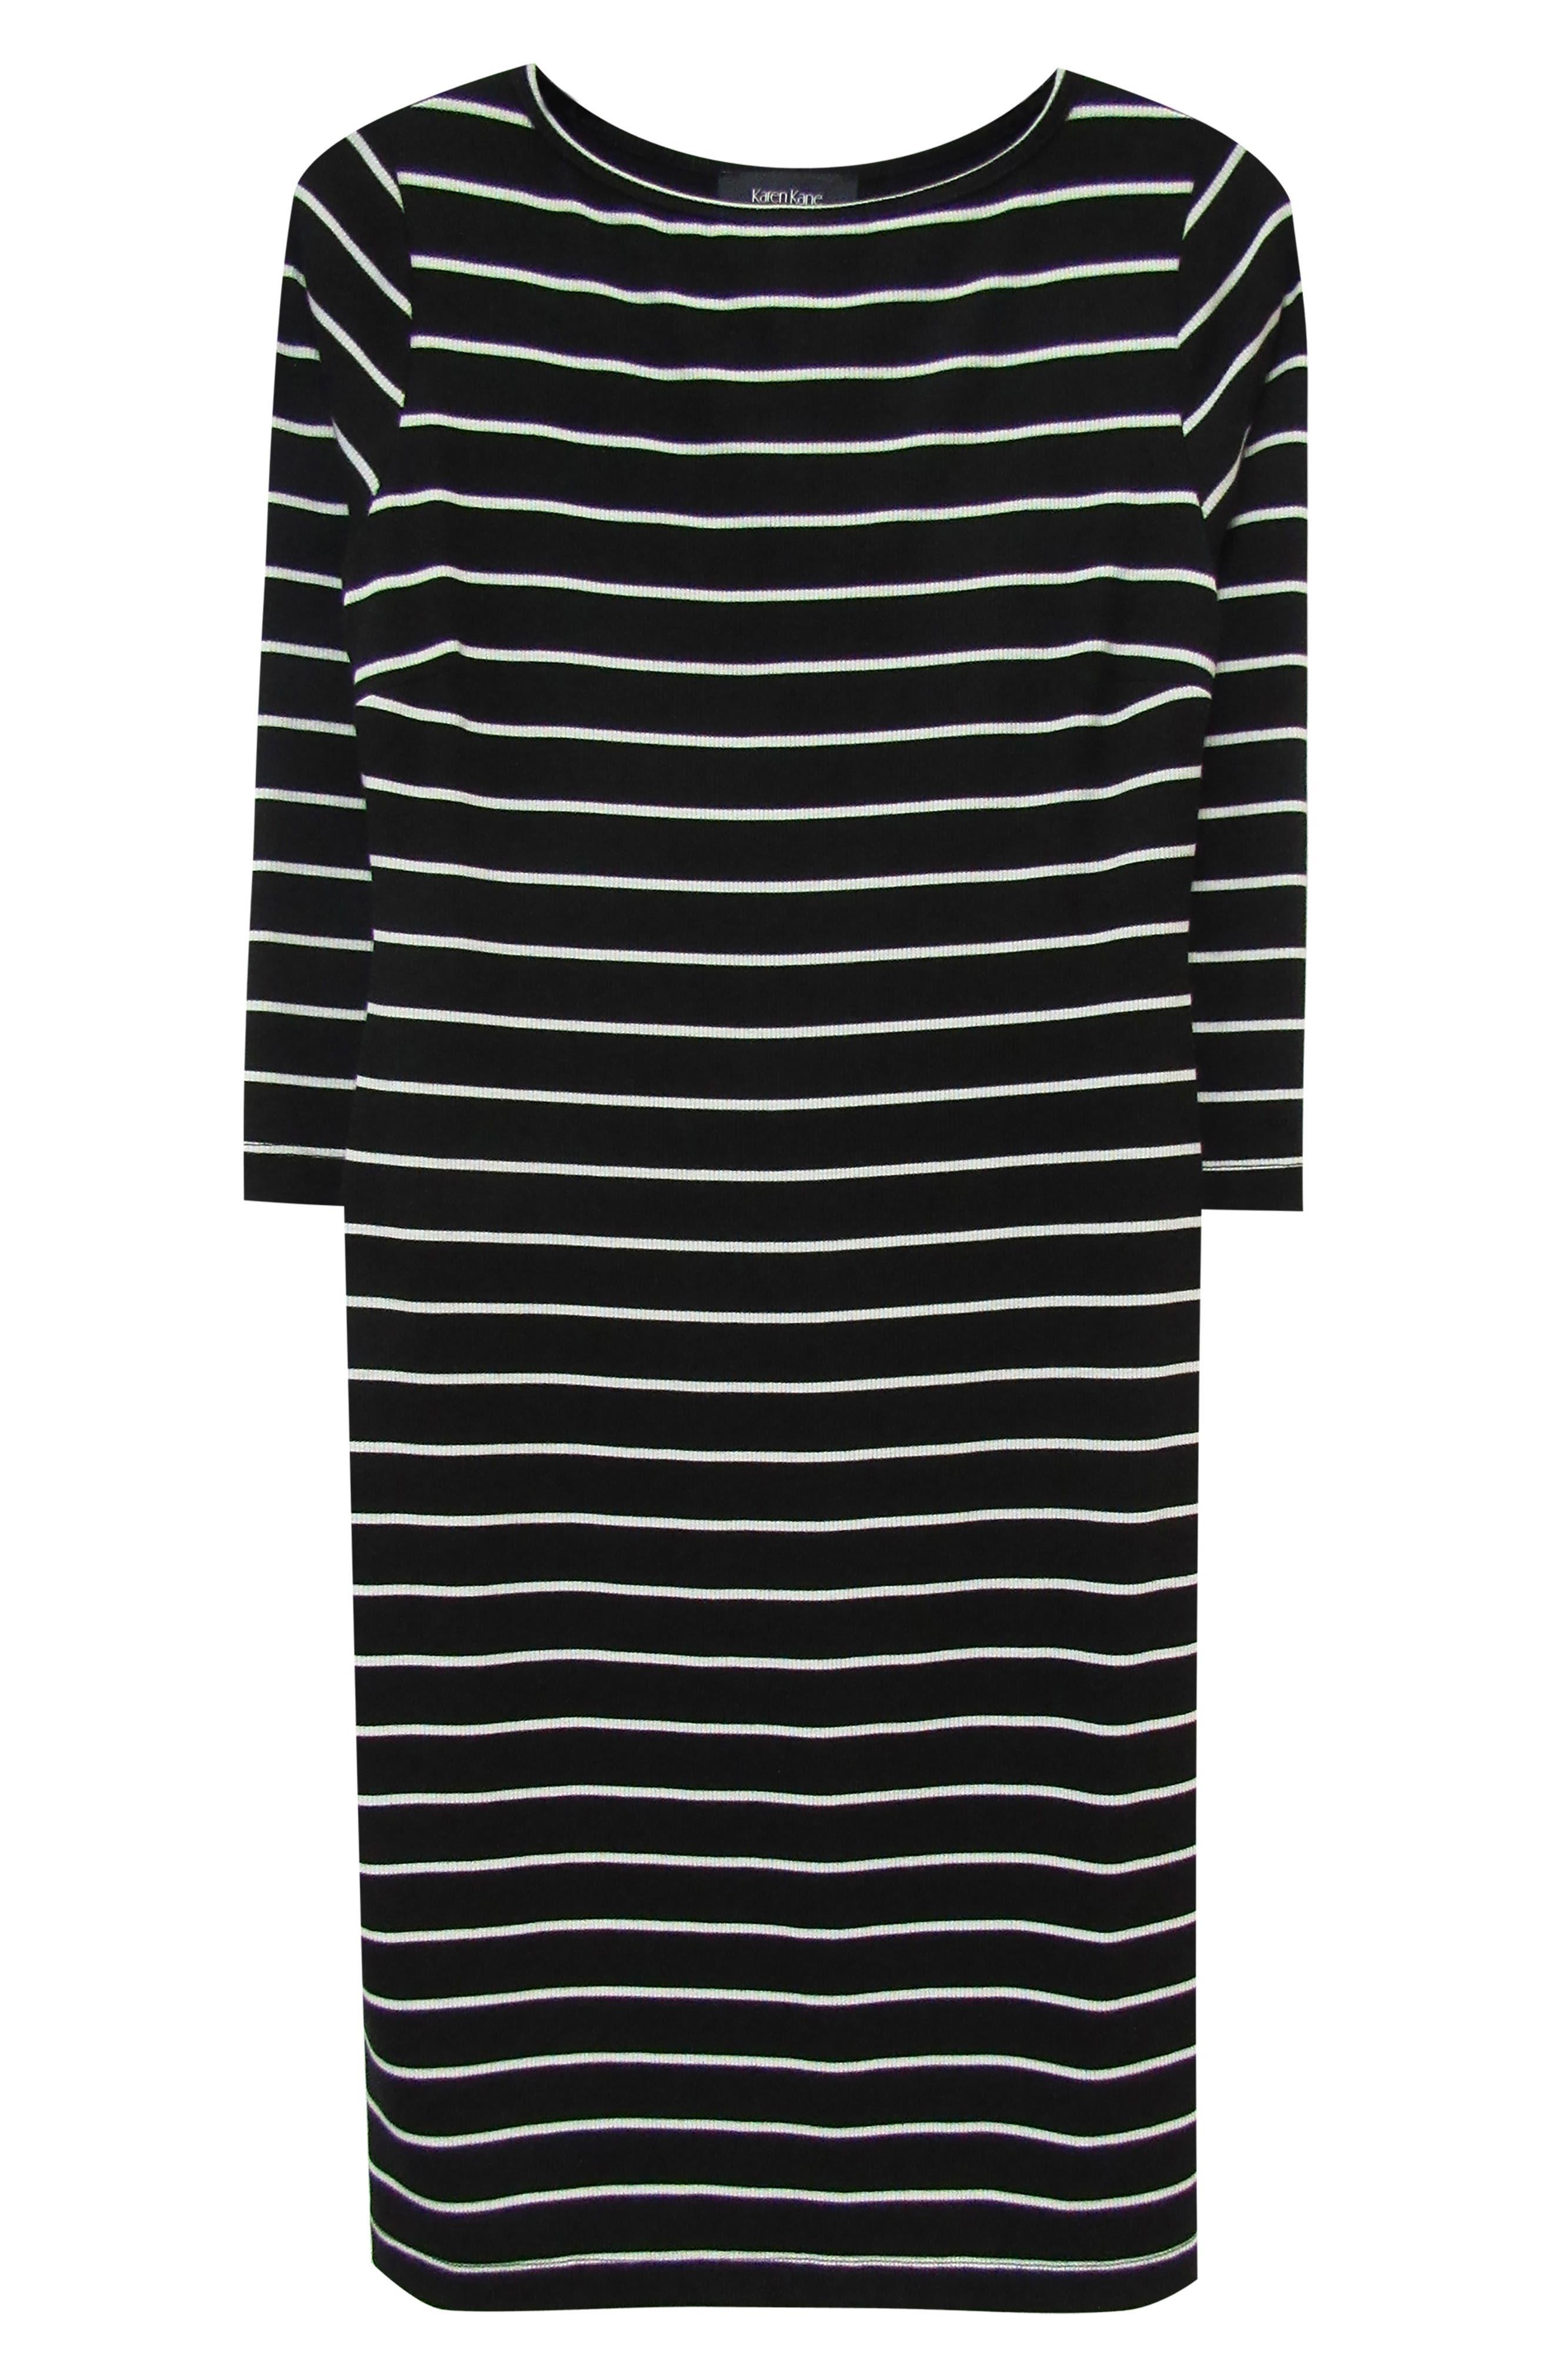 KAREN KANE, Stripe Body-Con Dress, Alternate thumbnail 3, color, STRIPE